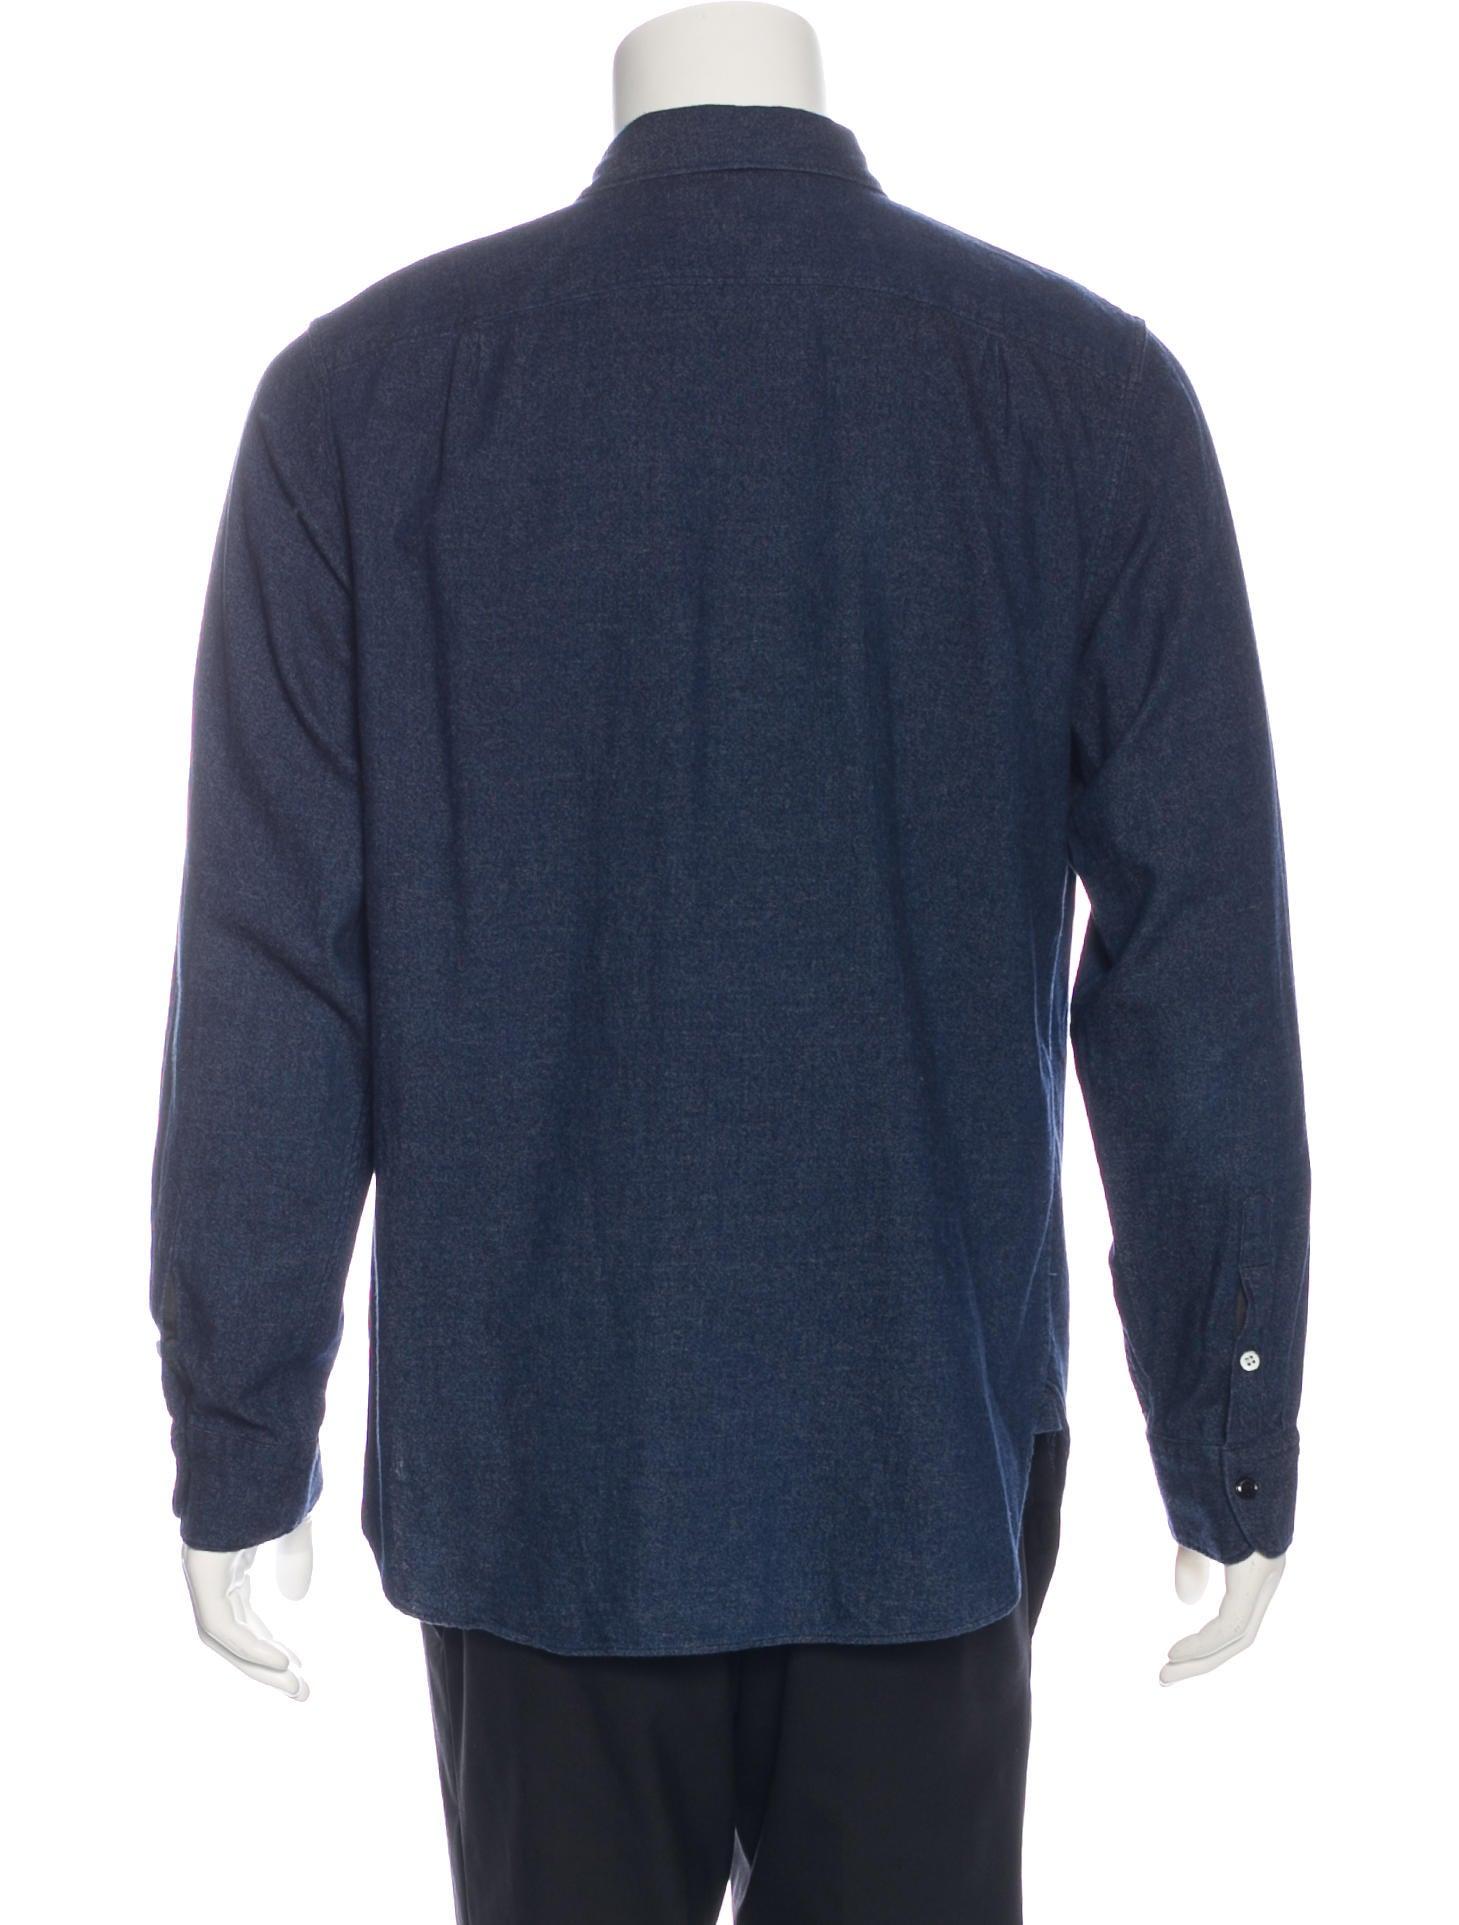 Rag bone classic fit chambray shirt clothing for Rag and bone mens shirts sale